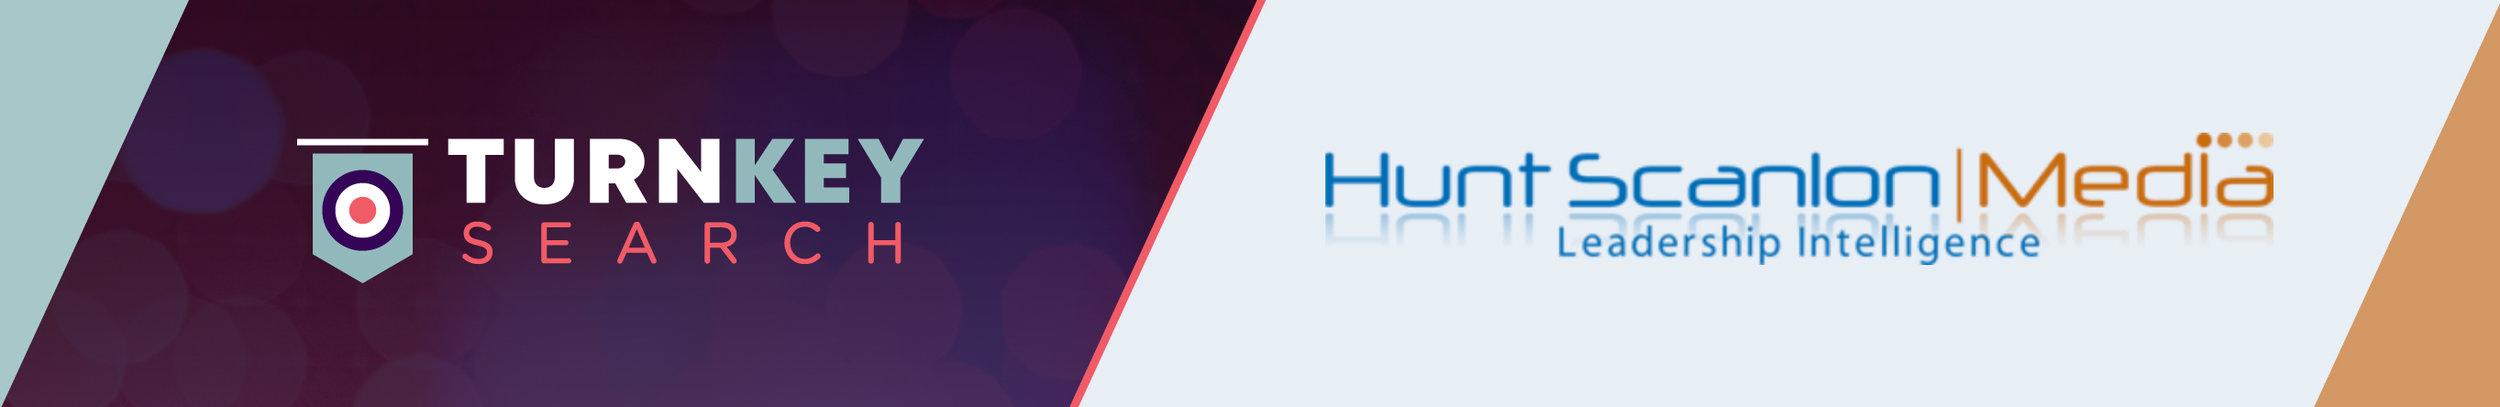 Turnkey Search-Hunt-Scanlon.jpg